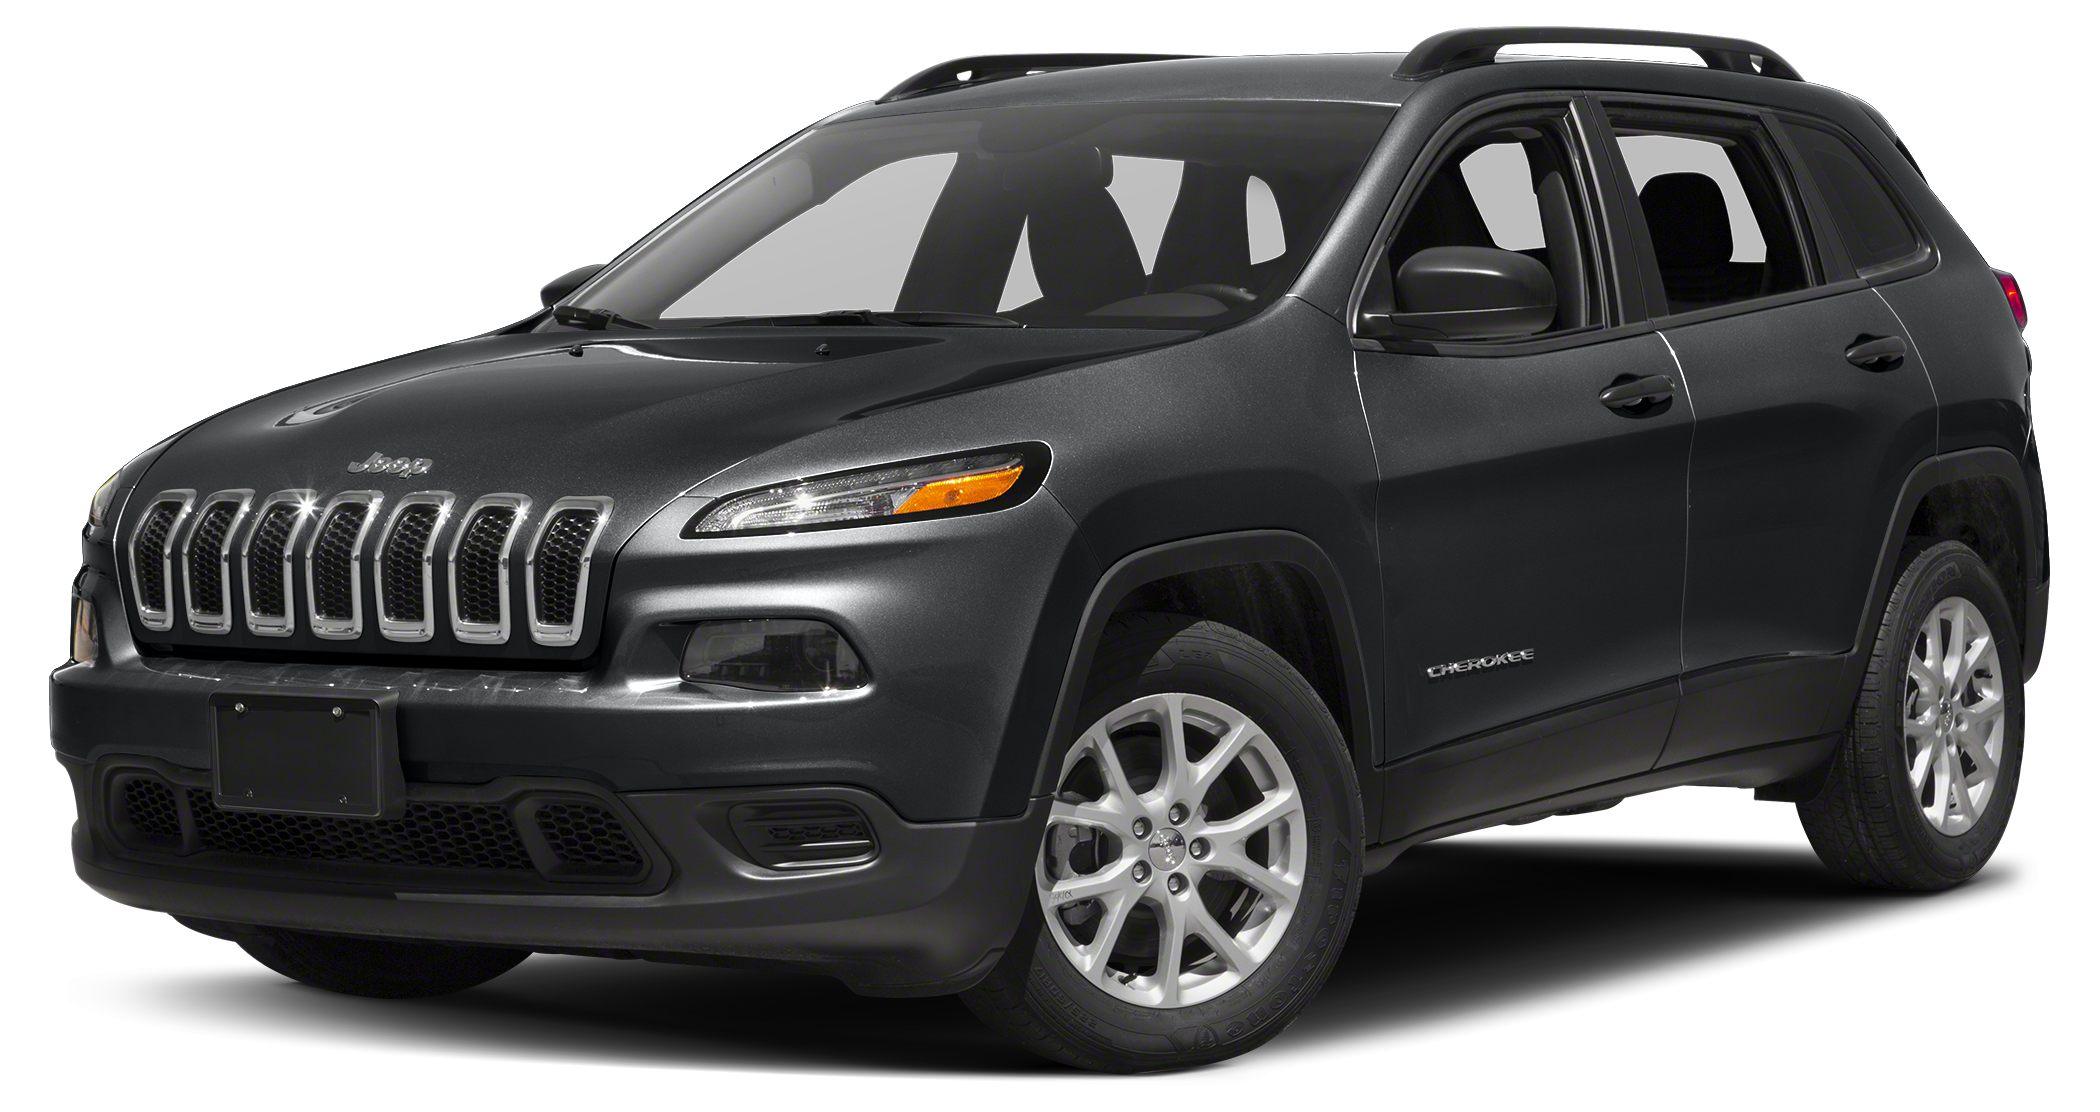 2017 Jeep Cherokee Sport Altitude trim Granite Crystal Met Clear Coat exterior Bluetooth iPod